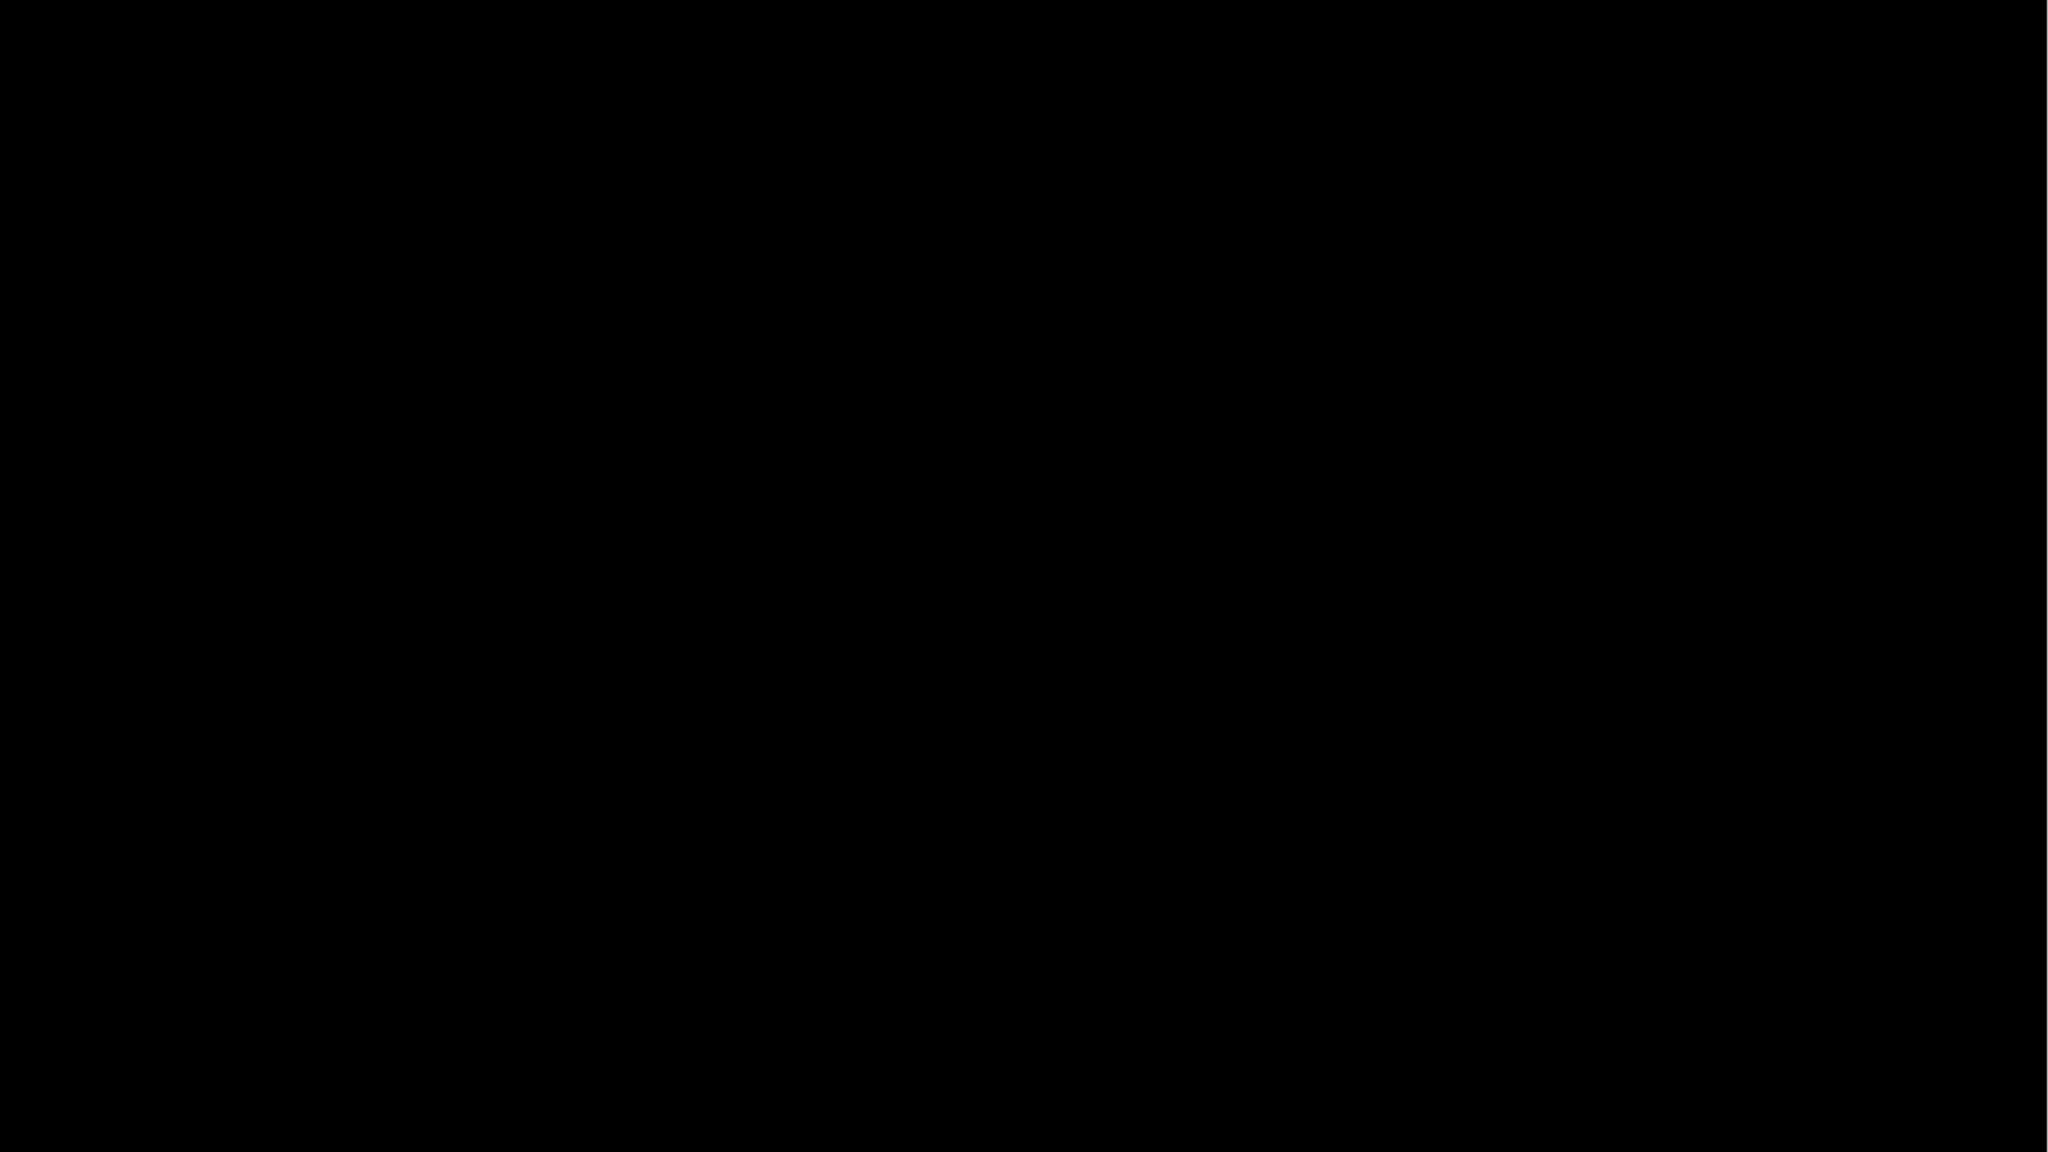 En svart ruta